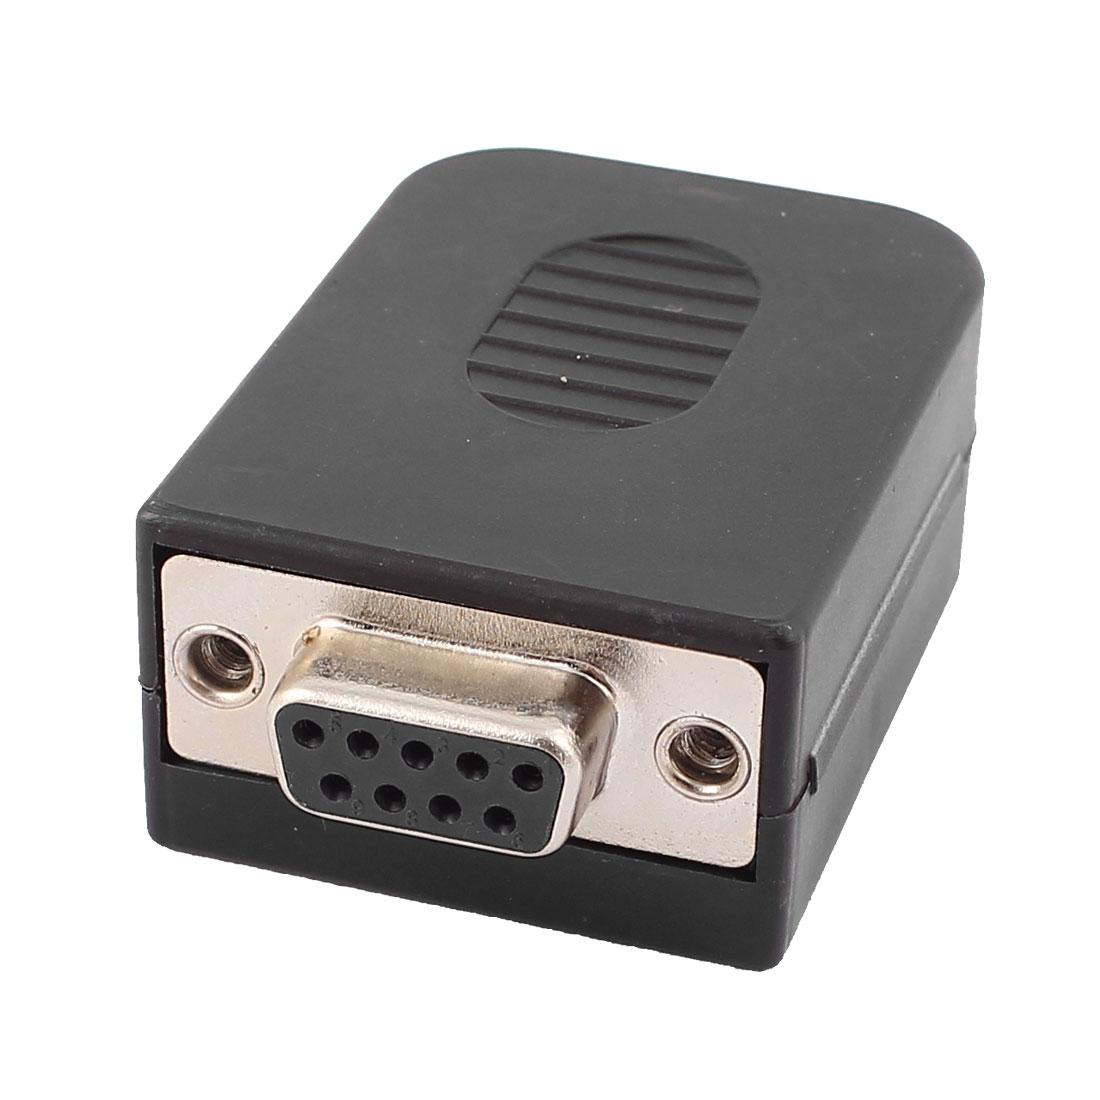 DB9 9-Pin VGA Female Socket D-SUB 2 Row Type Connector Adapter